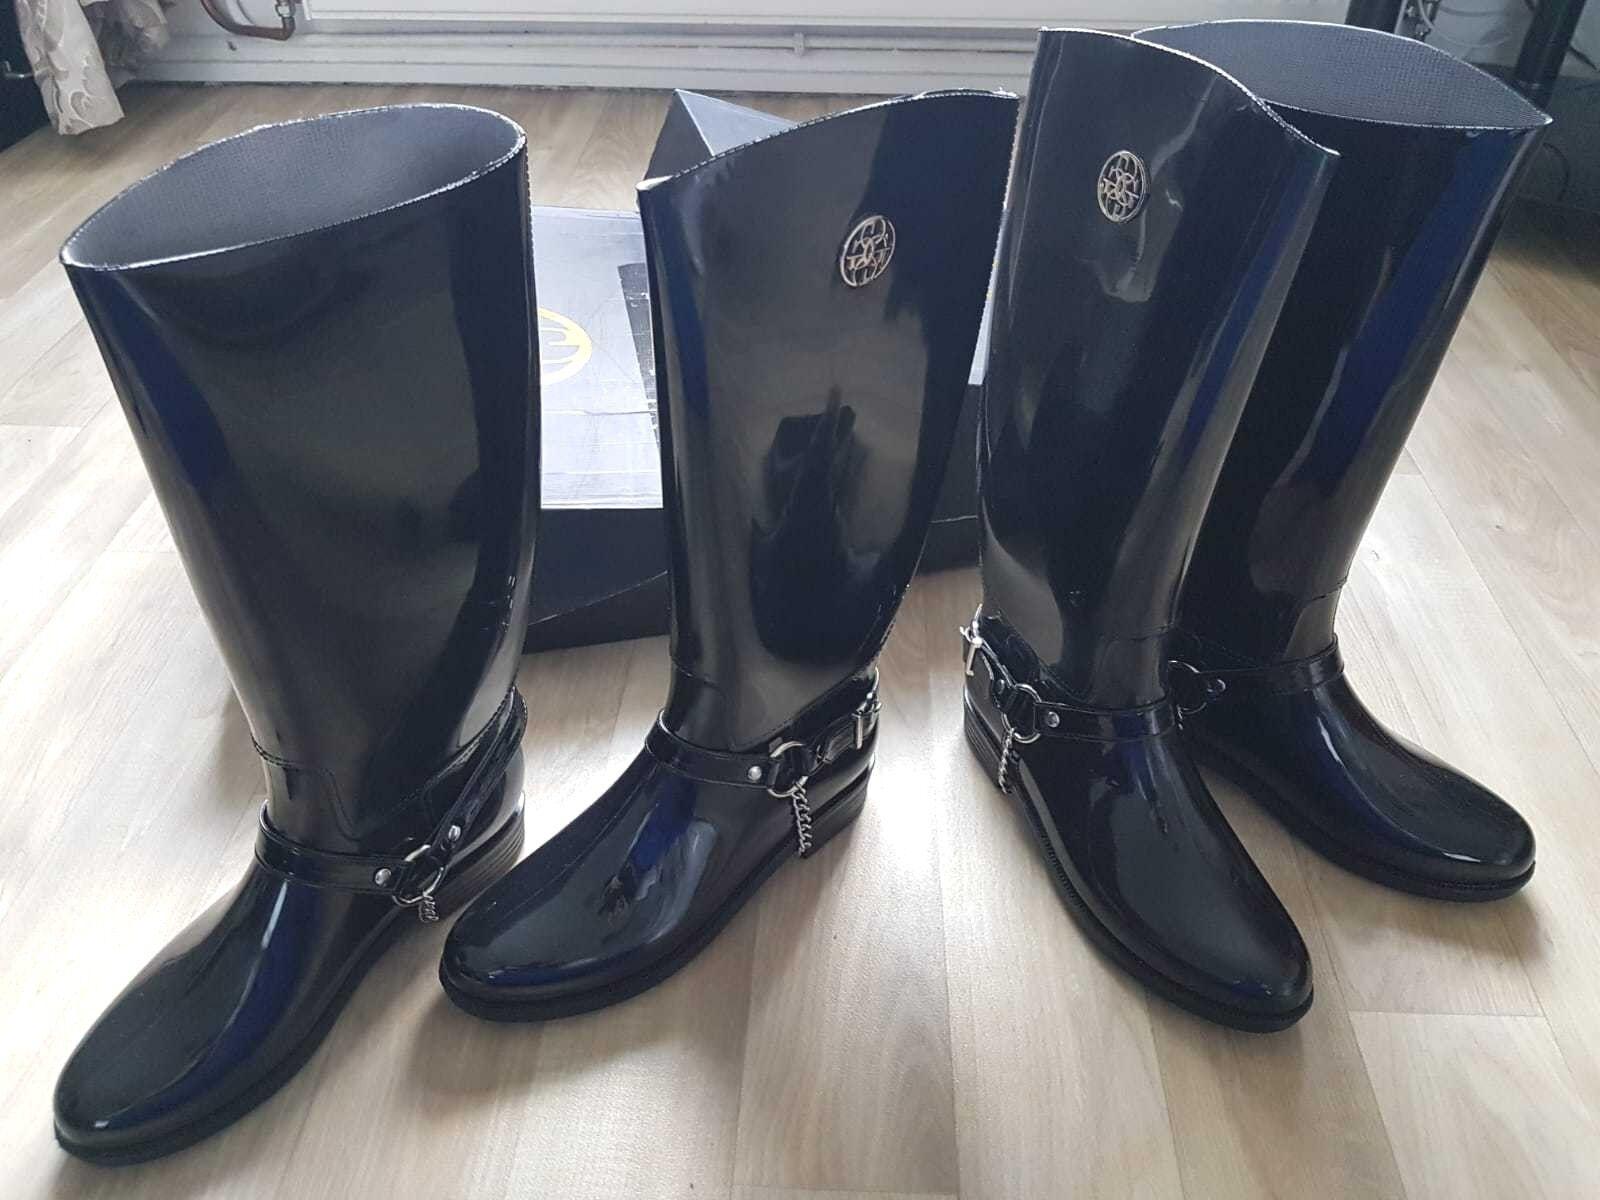 Designer Glamour Negro botas Talla L-Reino Unido 5.5 5.5 5.5 6 euro 39 40 Precio Original  calidad oficial